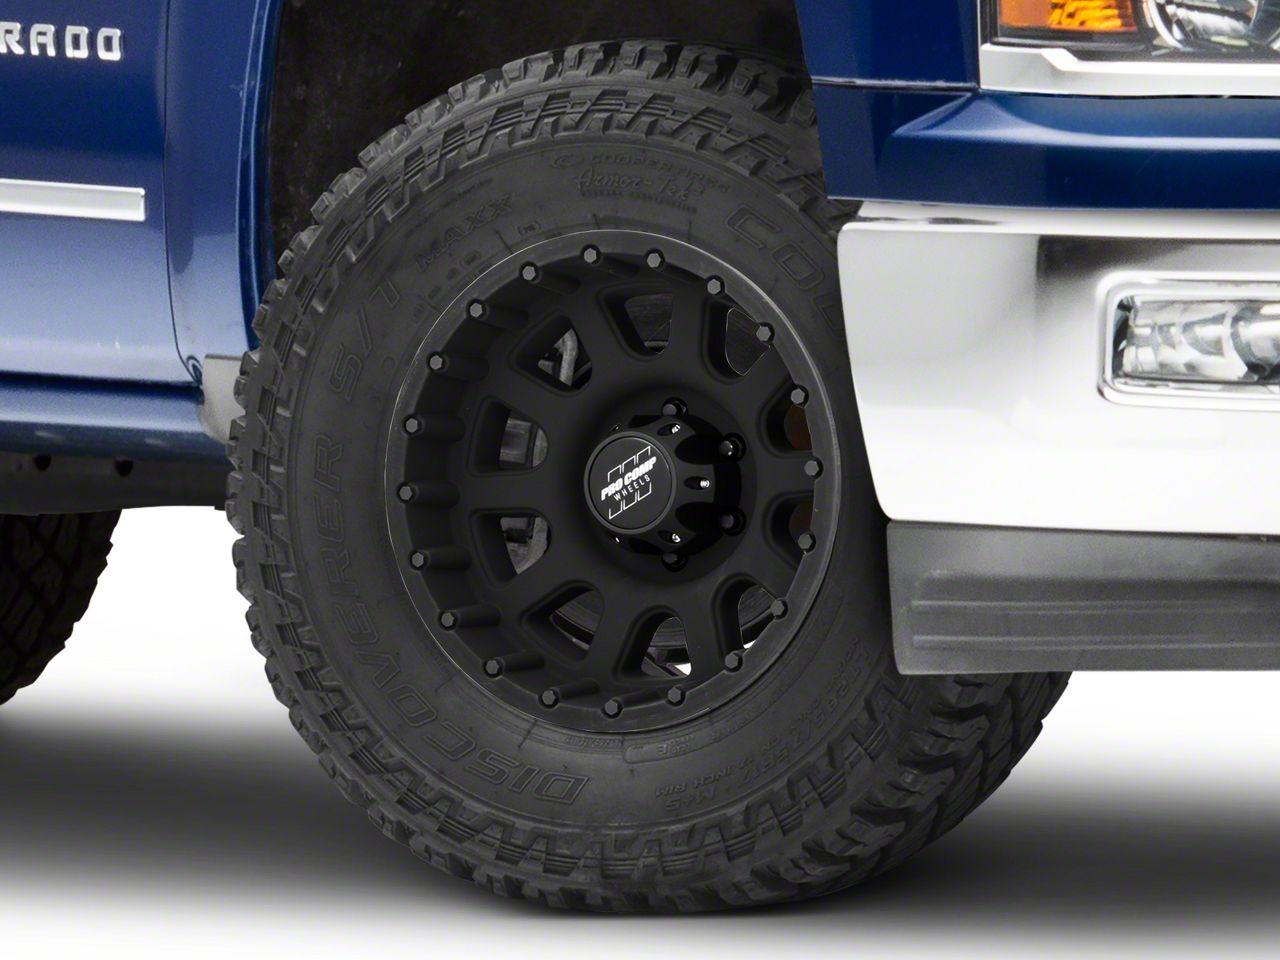 Pro Comp Series 7032 Matte Black 6-Lug Wheel - 18x9 (99-18 Silverado 1500)